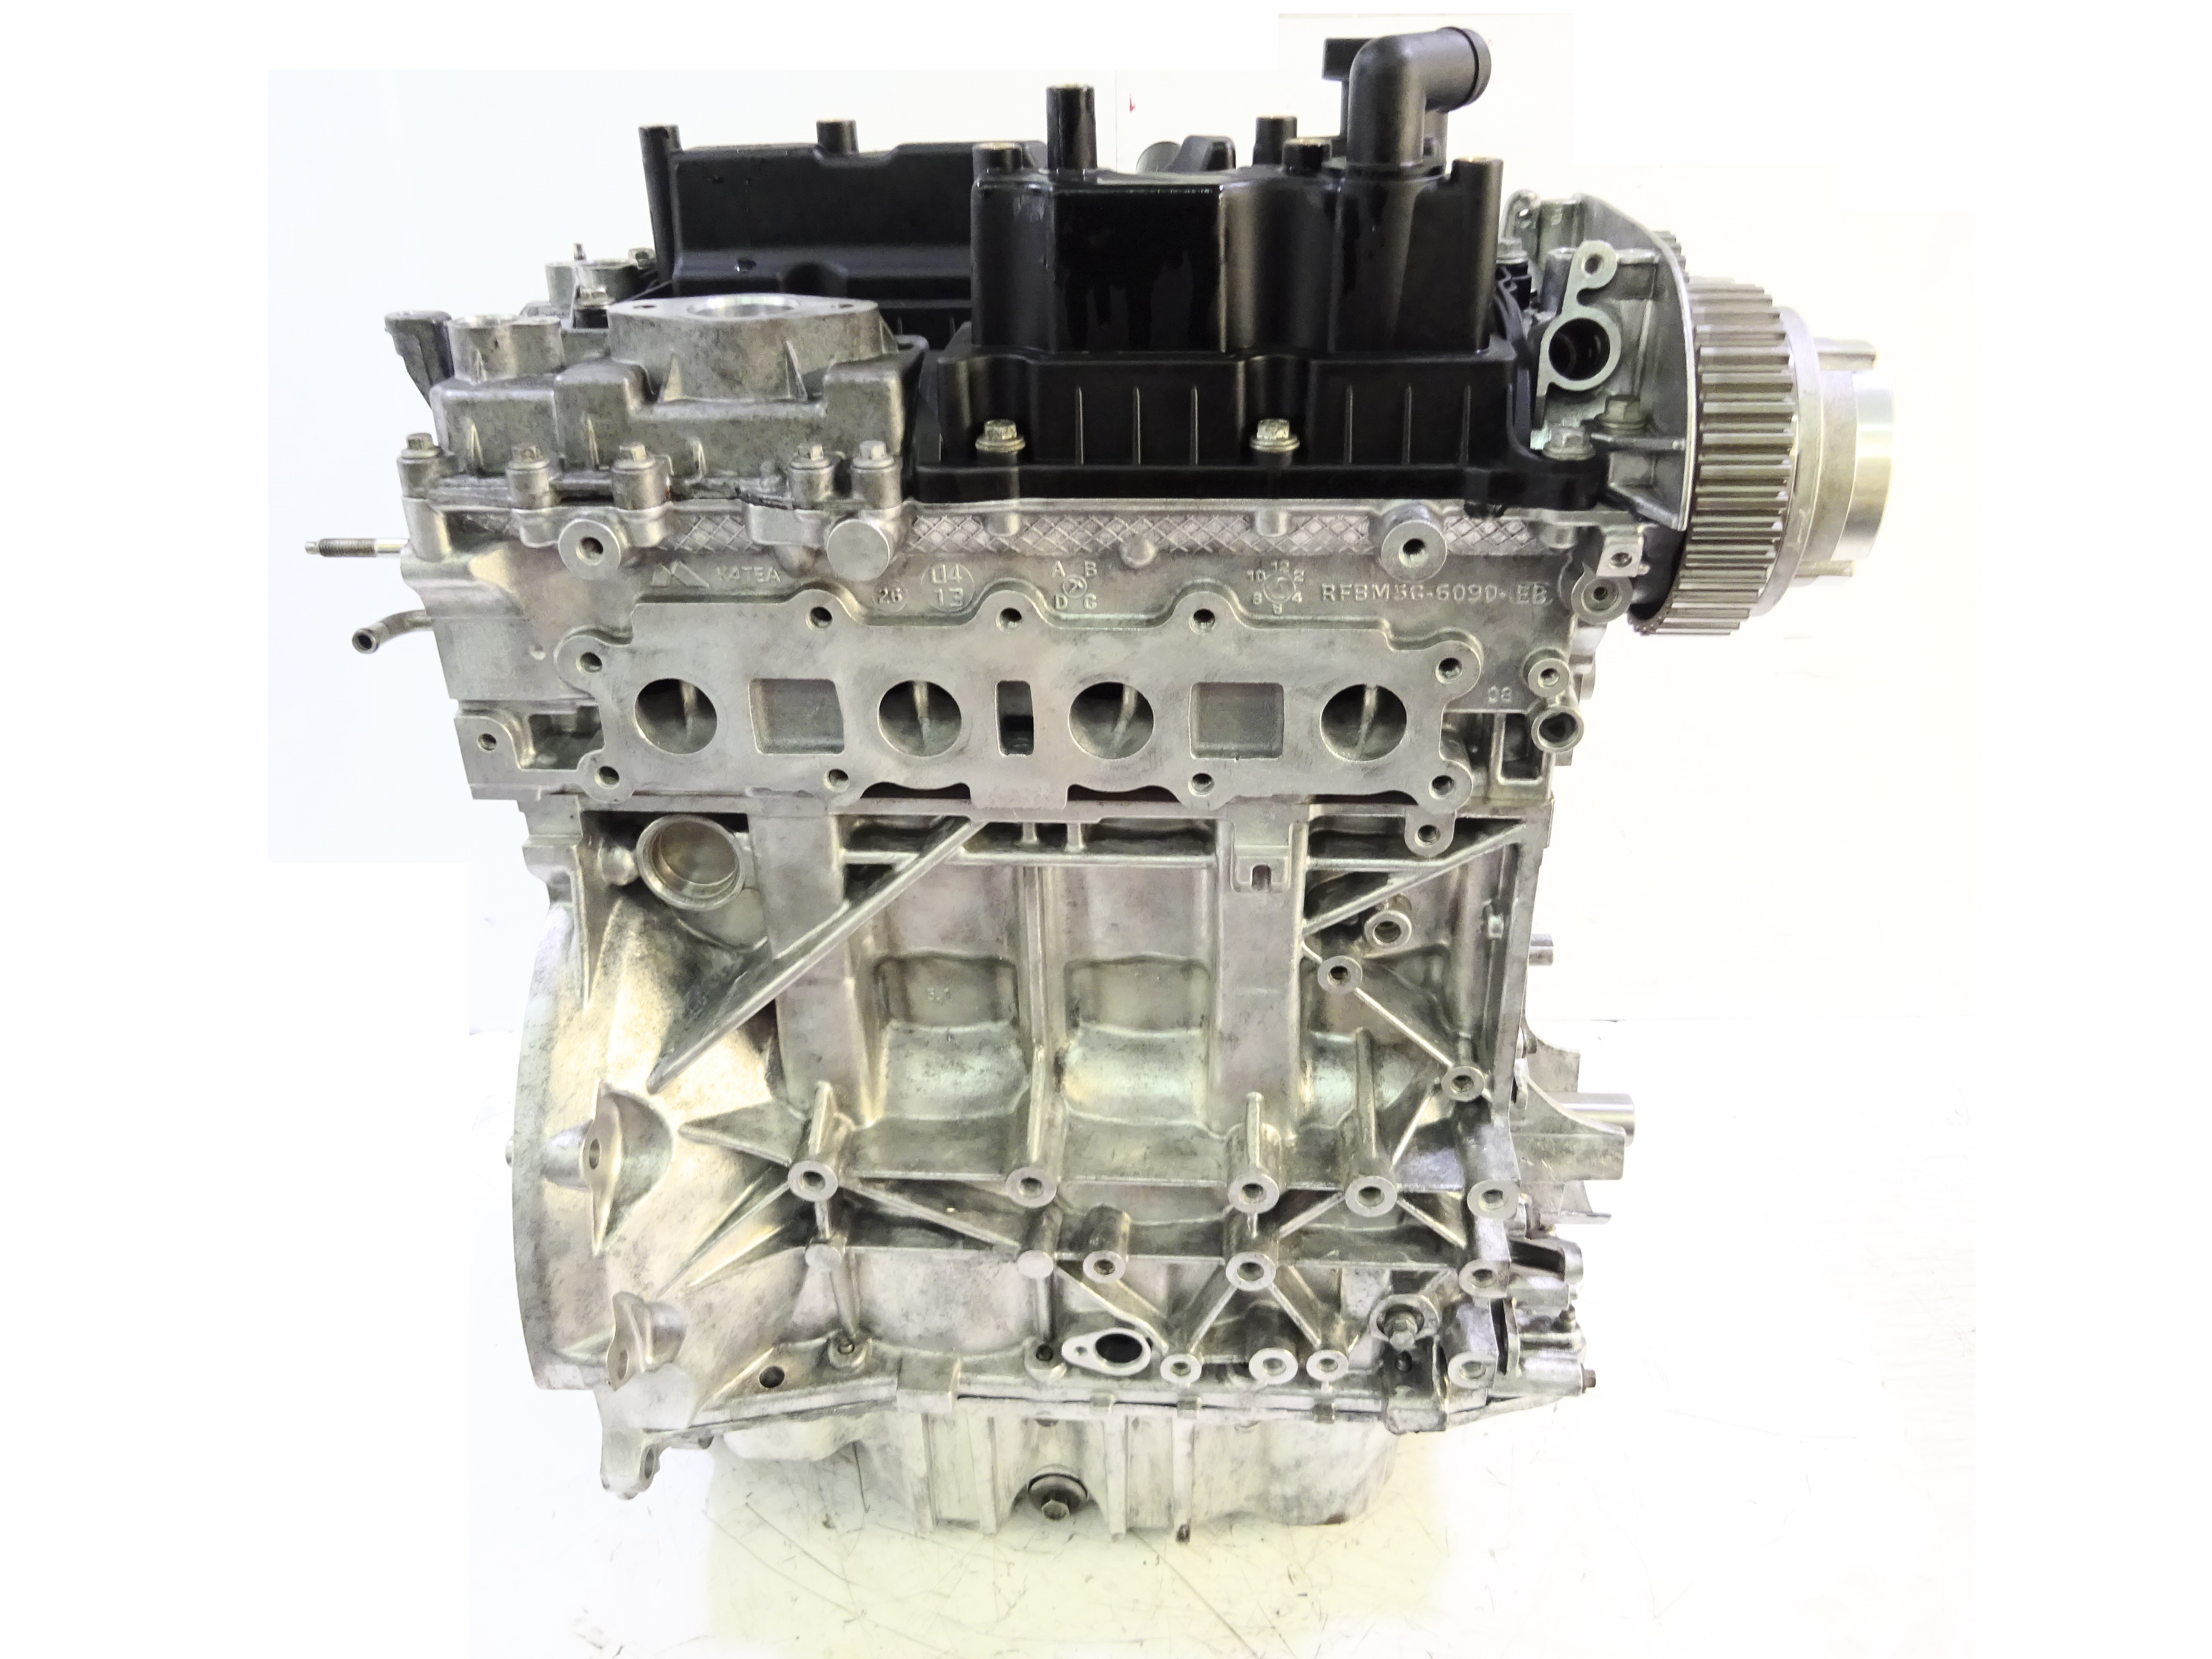 Motor 2014 für Ford Focus C-Max 1,6 EcoBoost JTDB Kopf geplant Kolben NEU